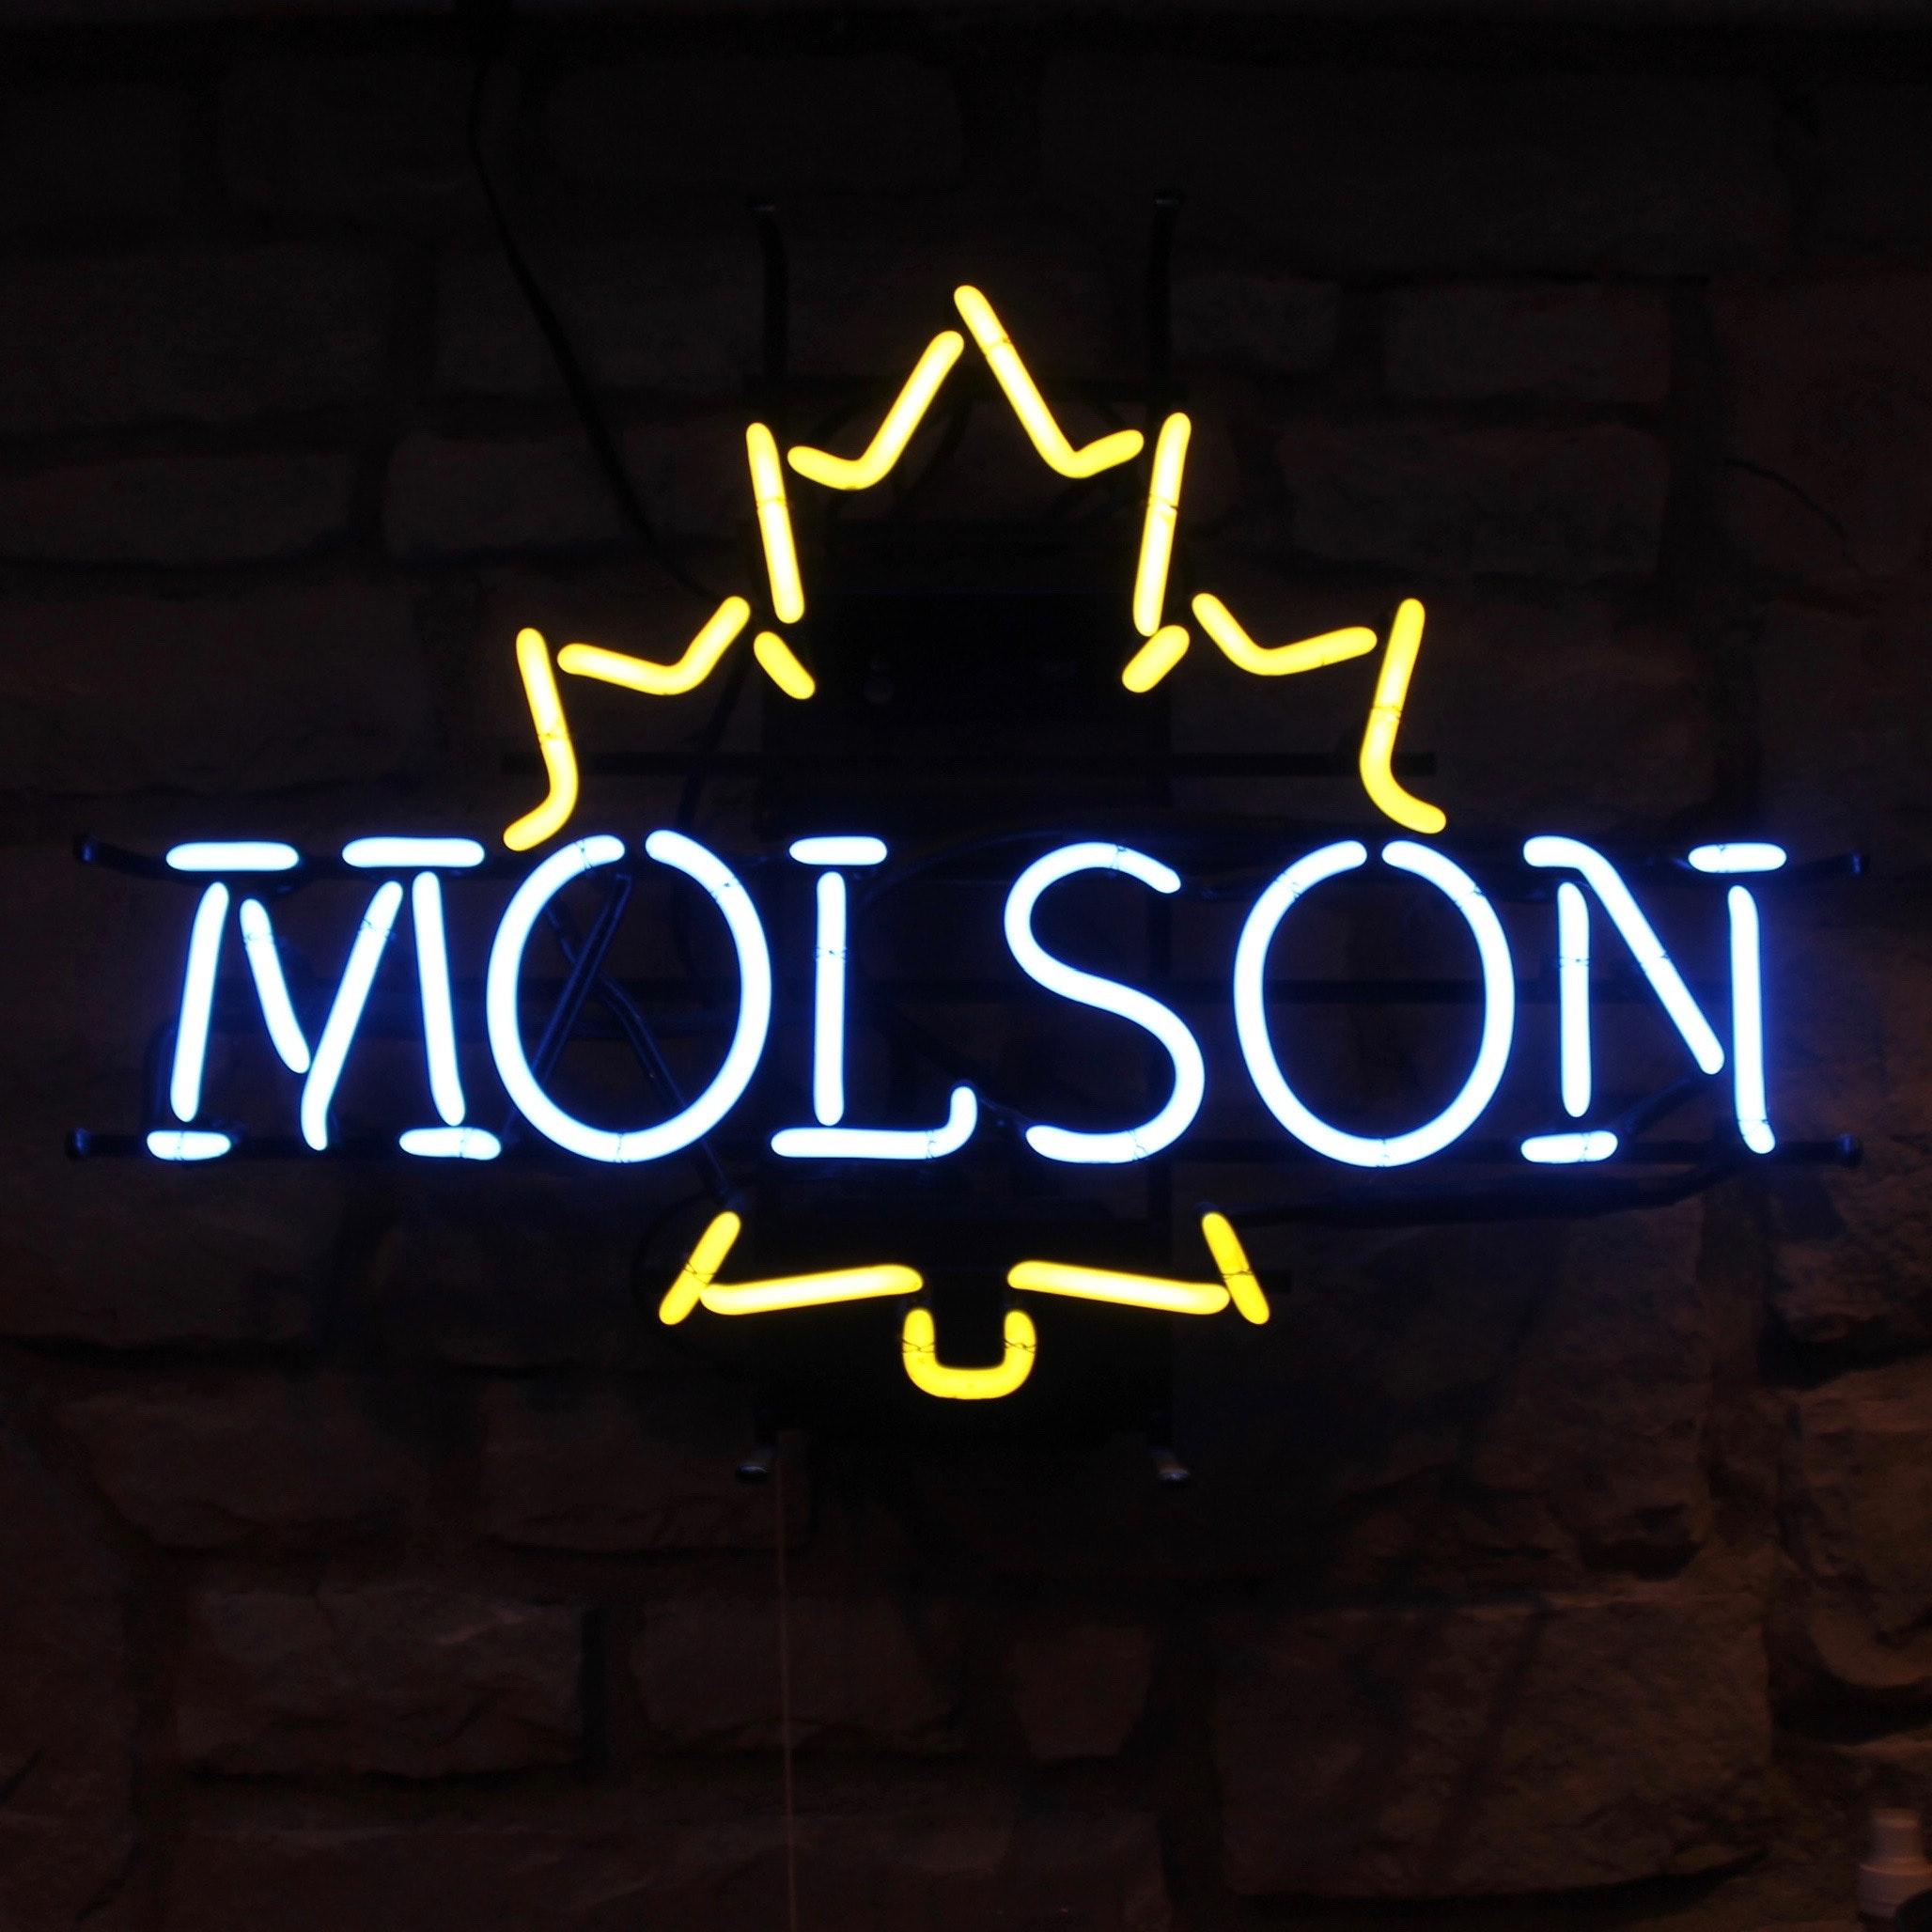 Molson Neon Lighted Sign